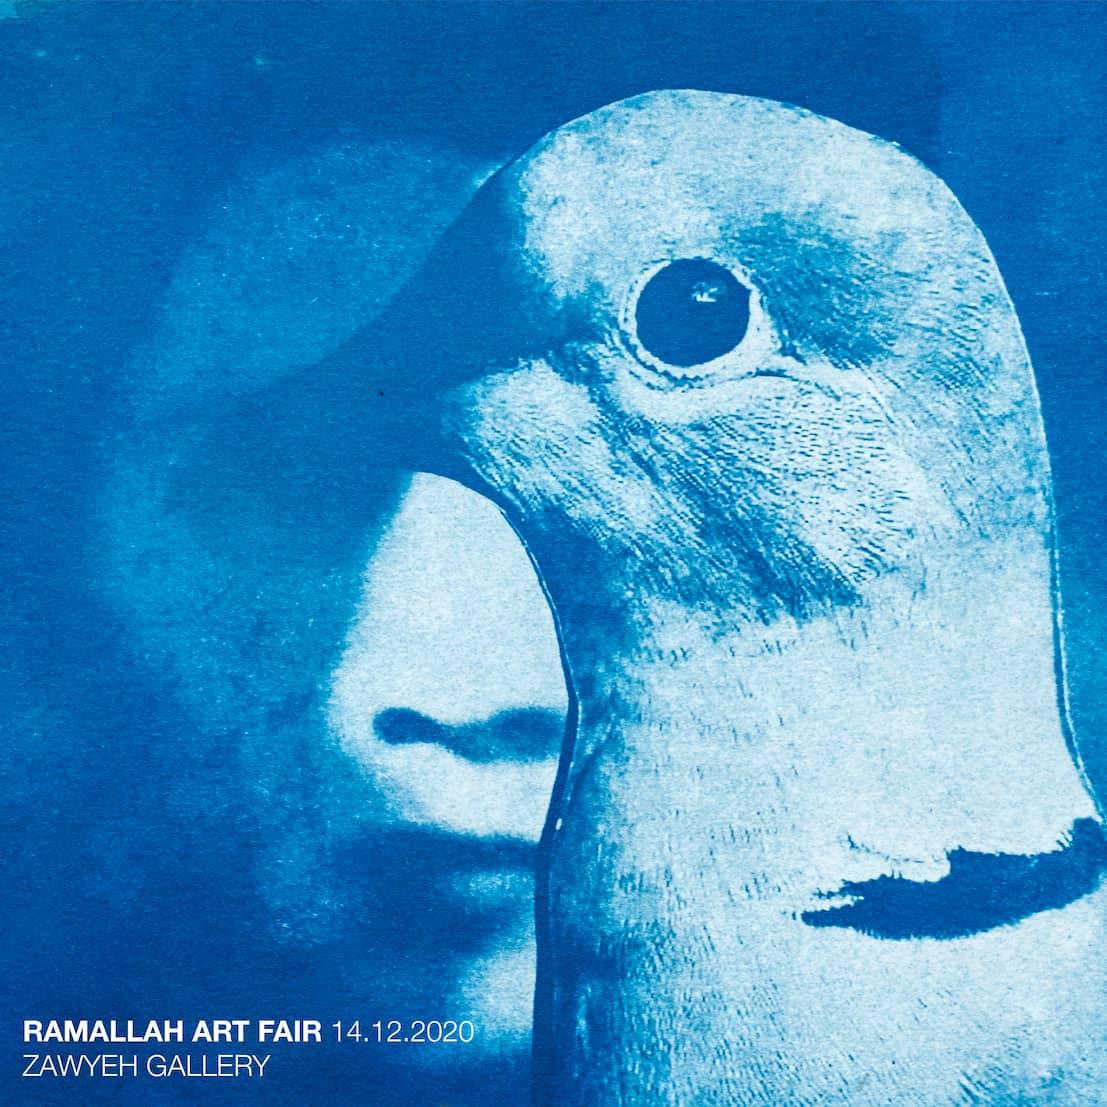 ramallah art fair, palestinian artists